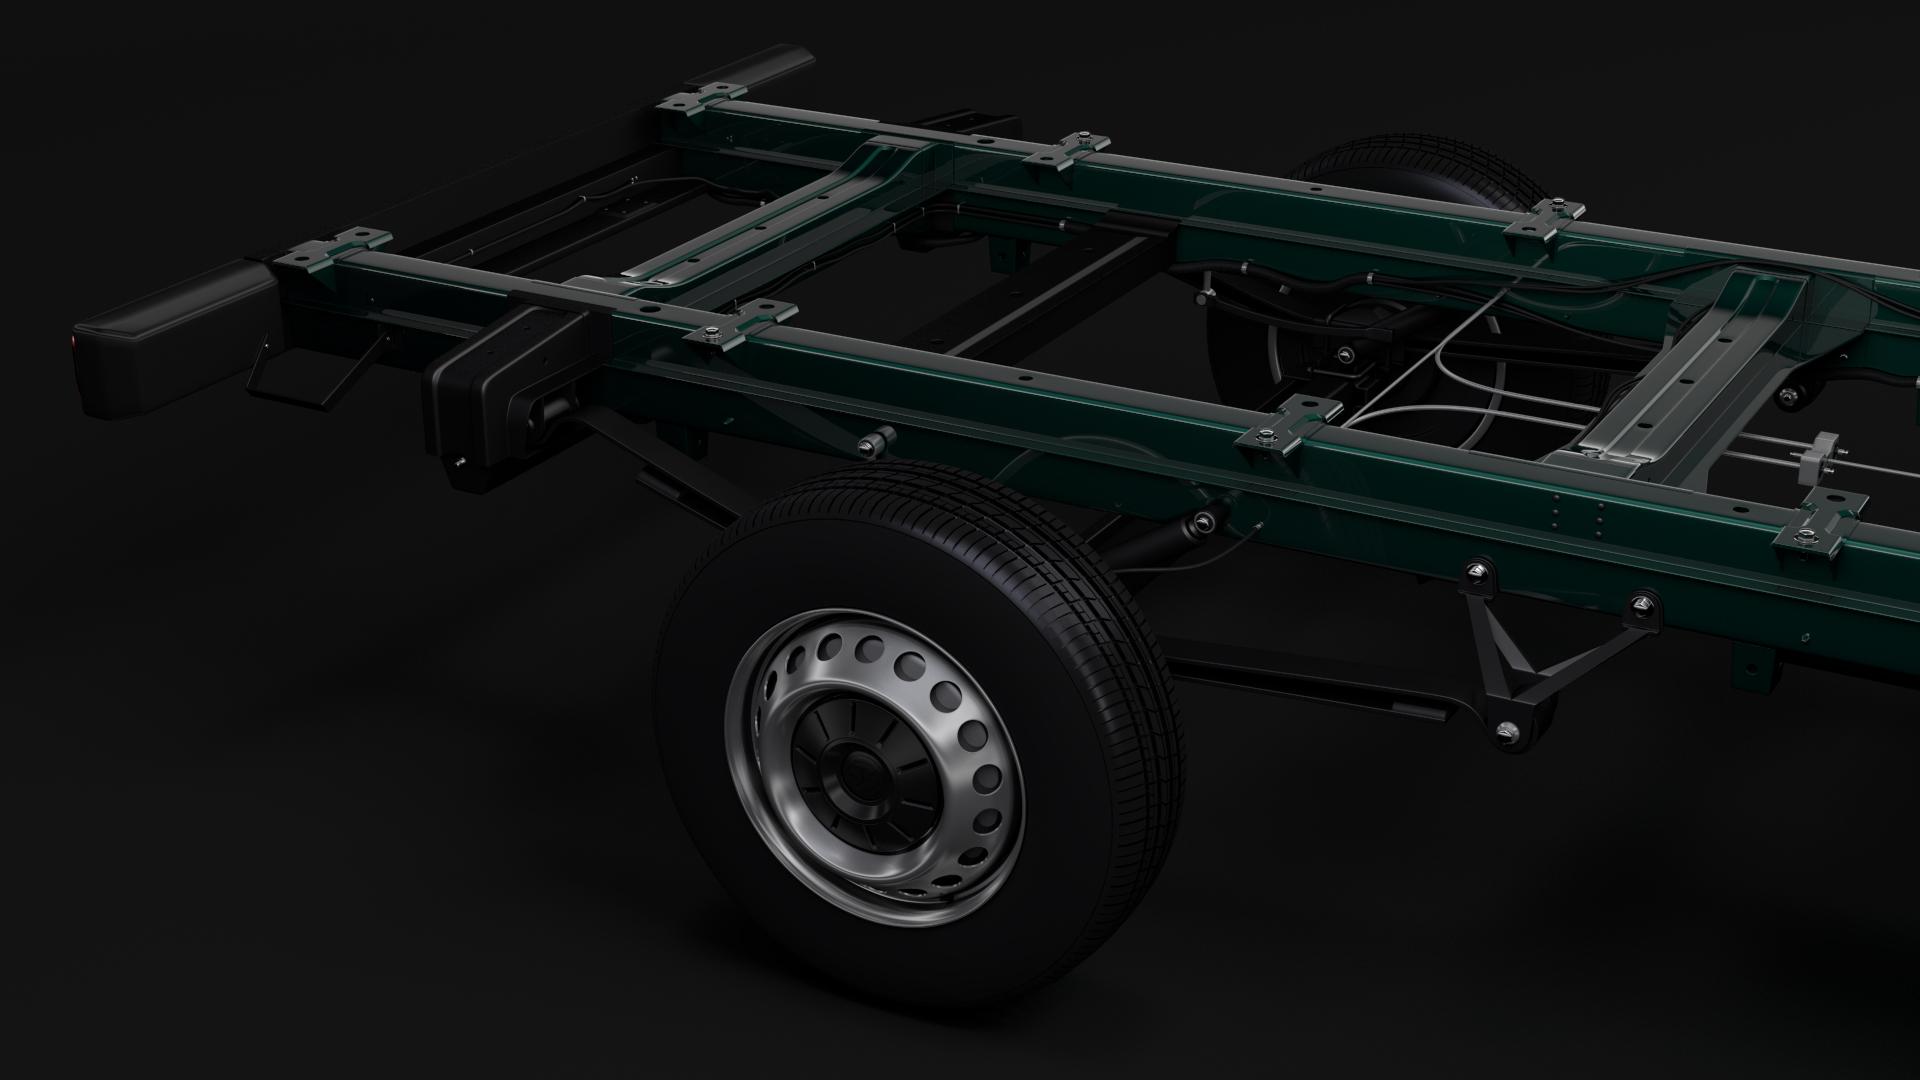 wv crafter chassis single-cab 2017 3d model max fbx c4d lwo ma mb hrc xsi obj 275099